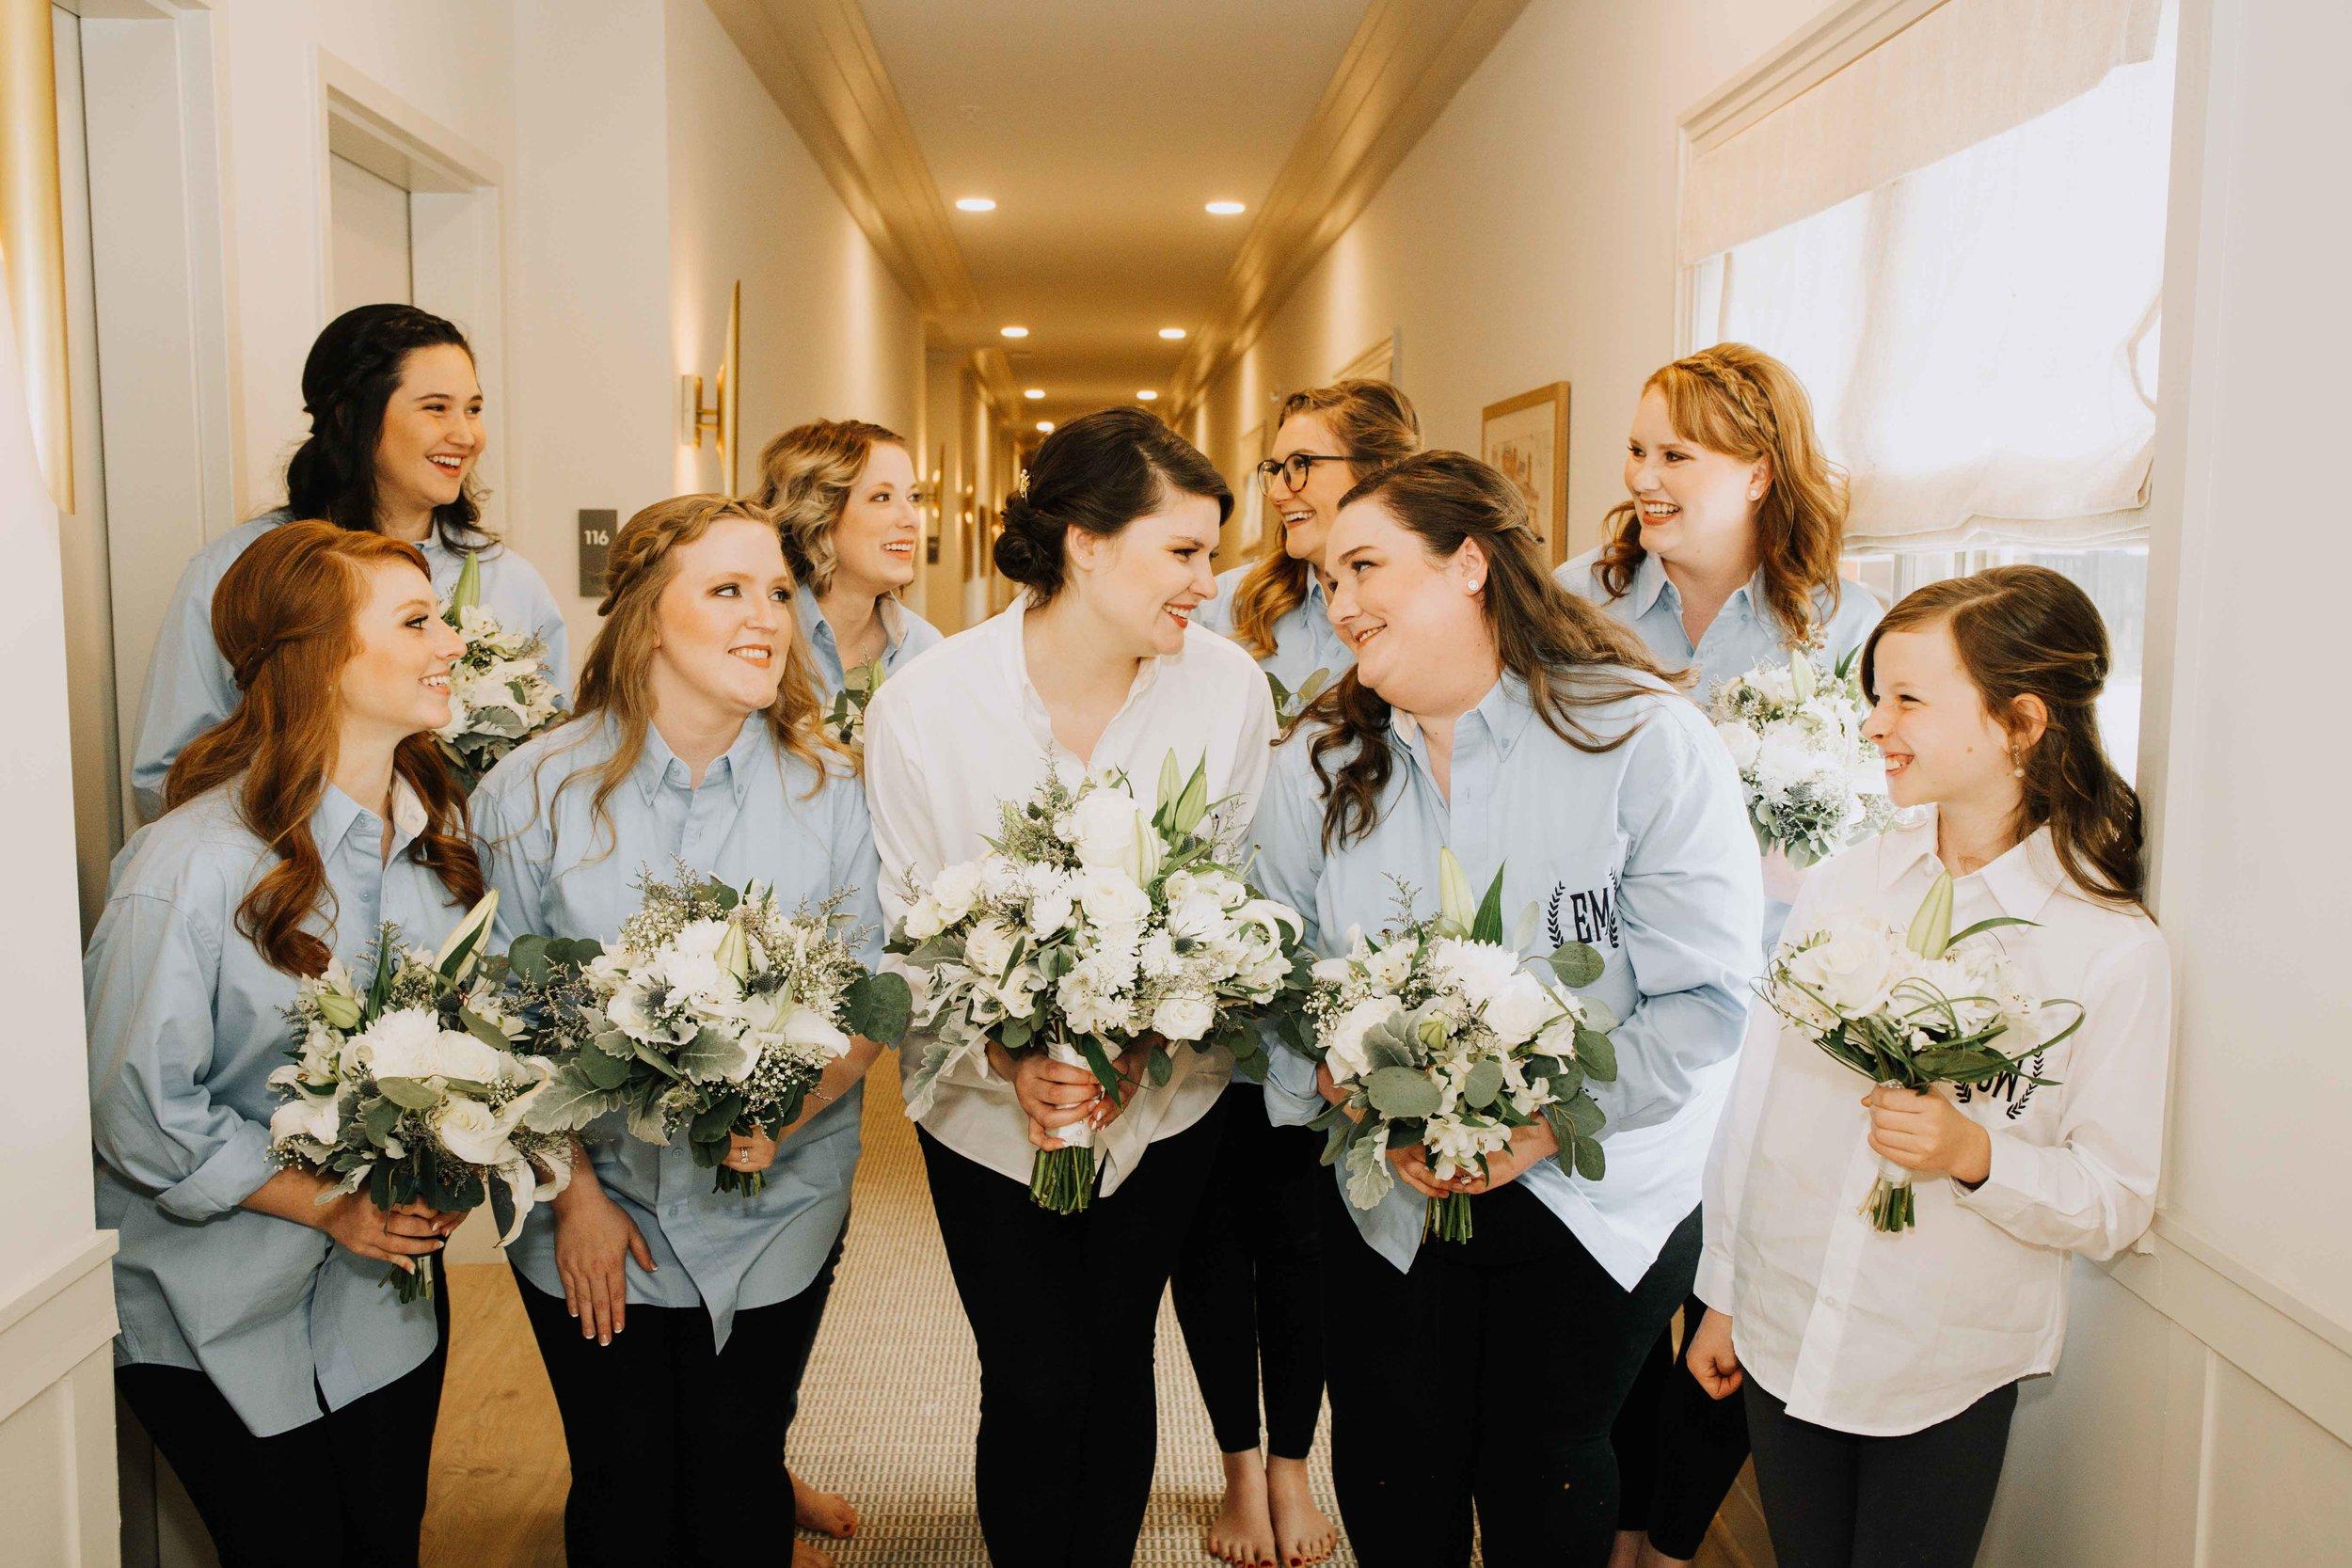 Farmville-Virginia-Wedding-Hotel-Weynoke-Downtown-Jacqueline-Waters-Photography-Detailed- (119).jpg